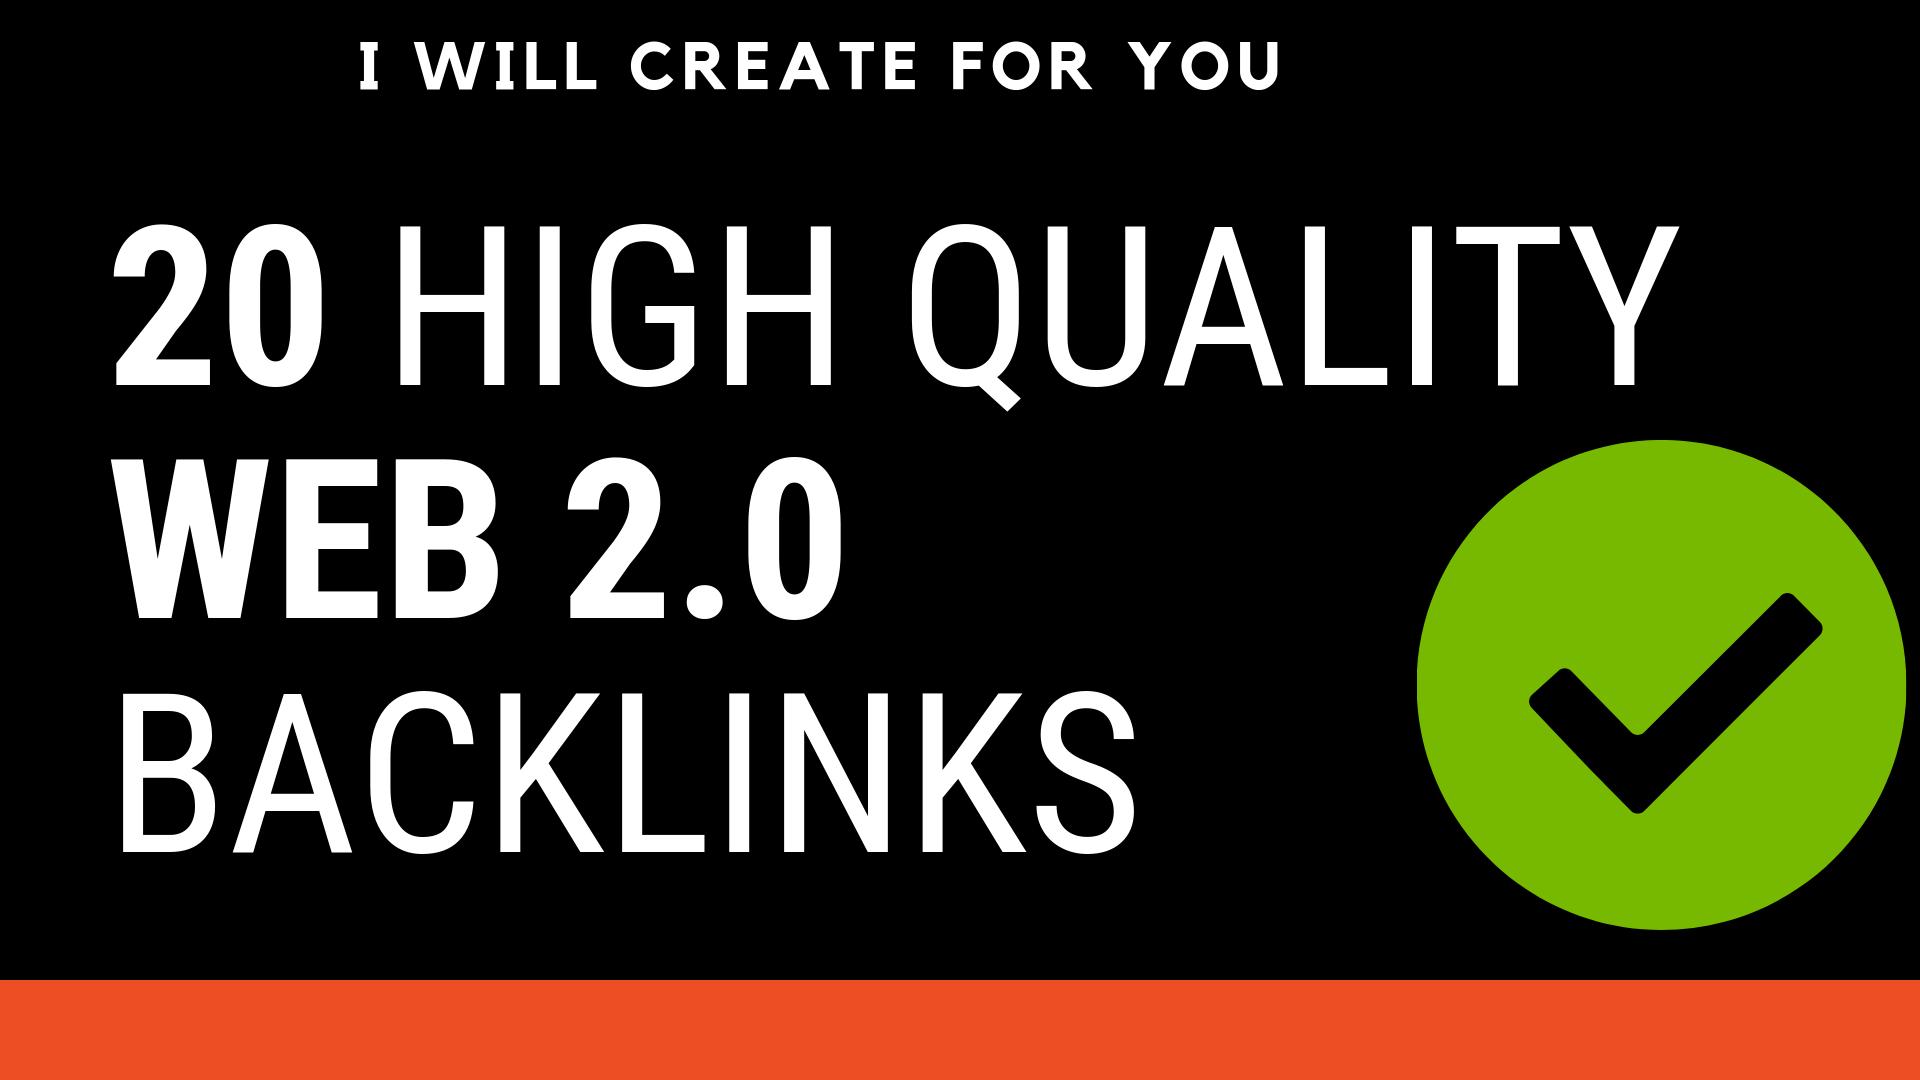 Create Manually web 2.0 Backlinks + 20 Bookmarking On high PR website